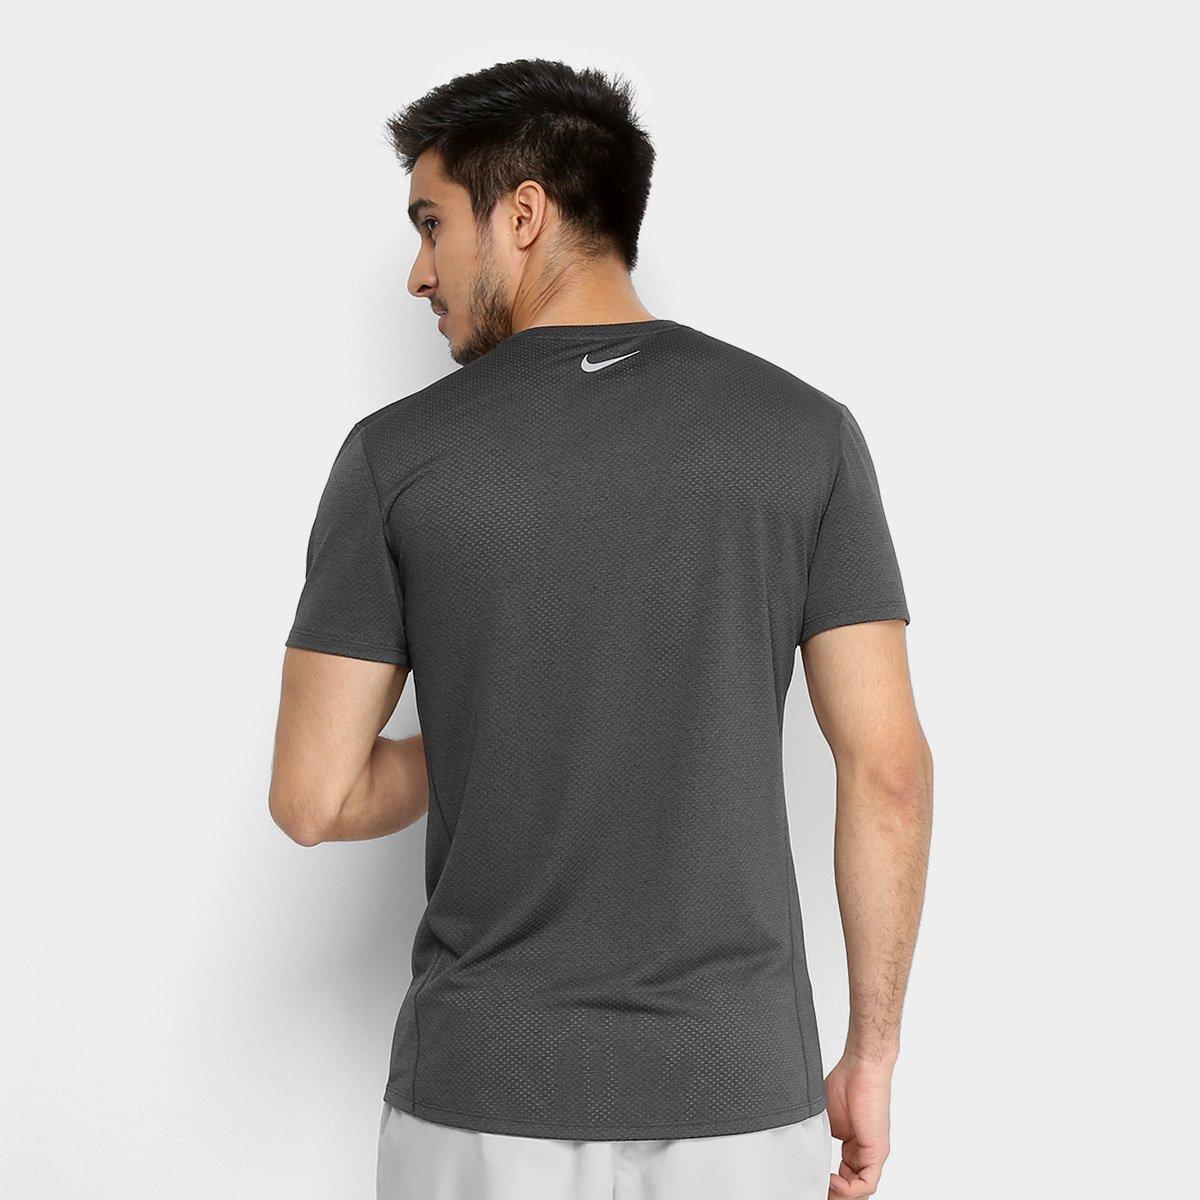 Camiseta Nike Dry Cool Miler SS Masculina - Cinza e Preto - Compre ... be986dcf82205